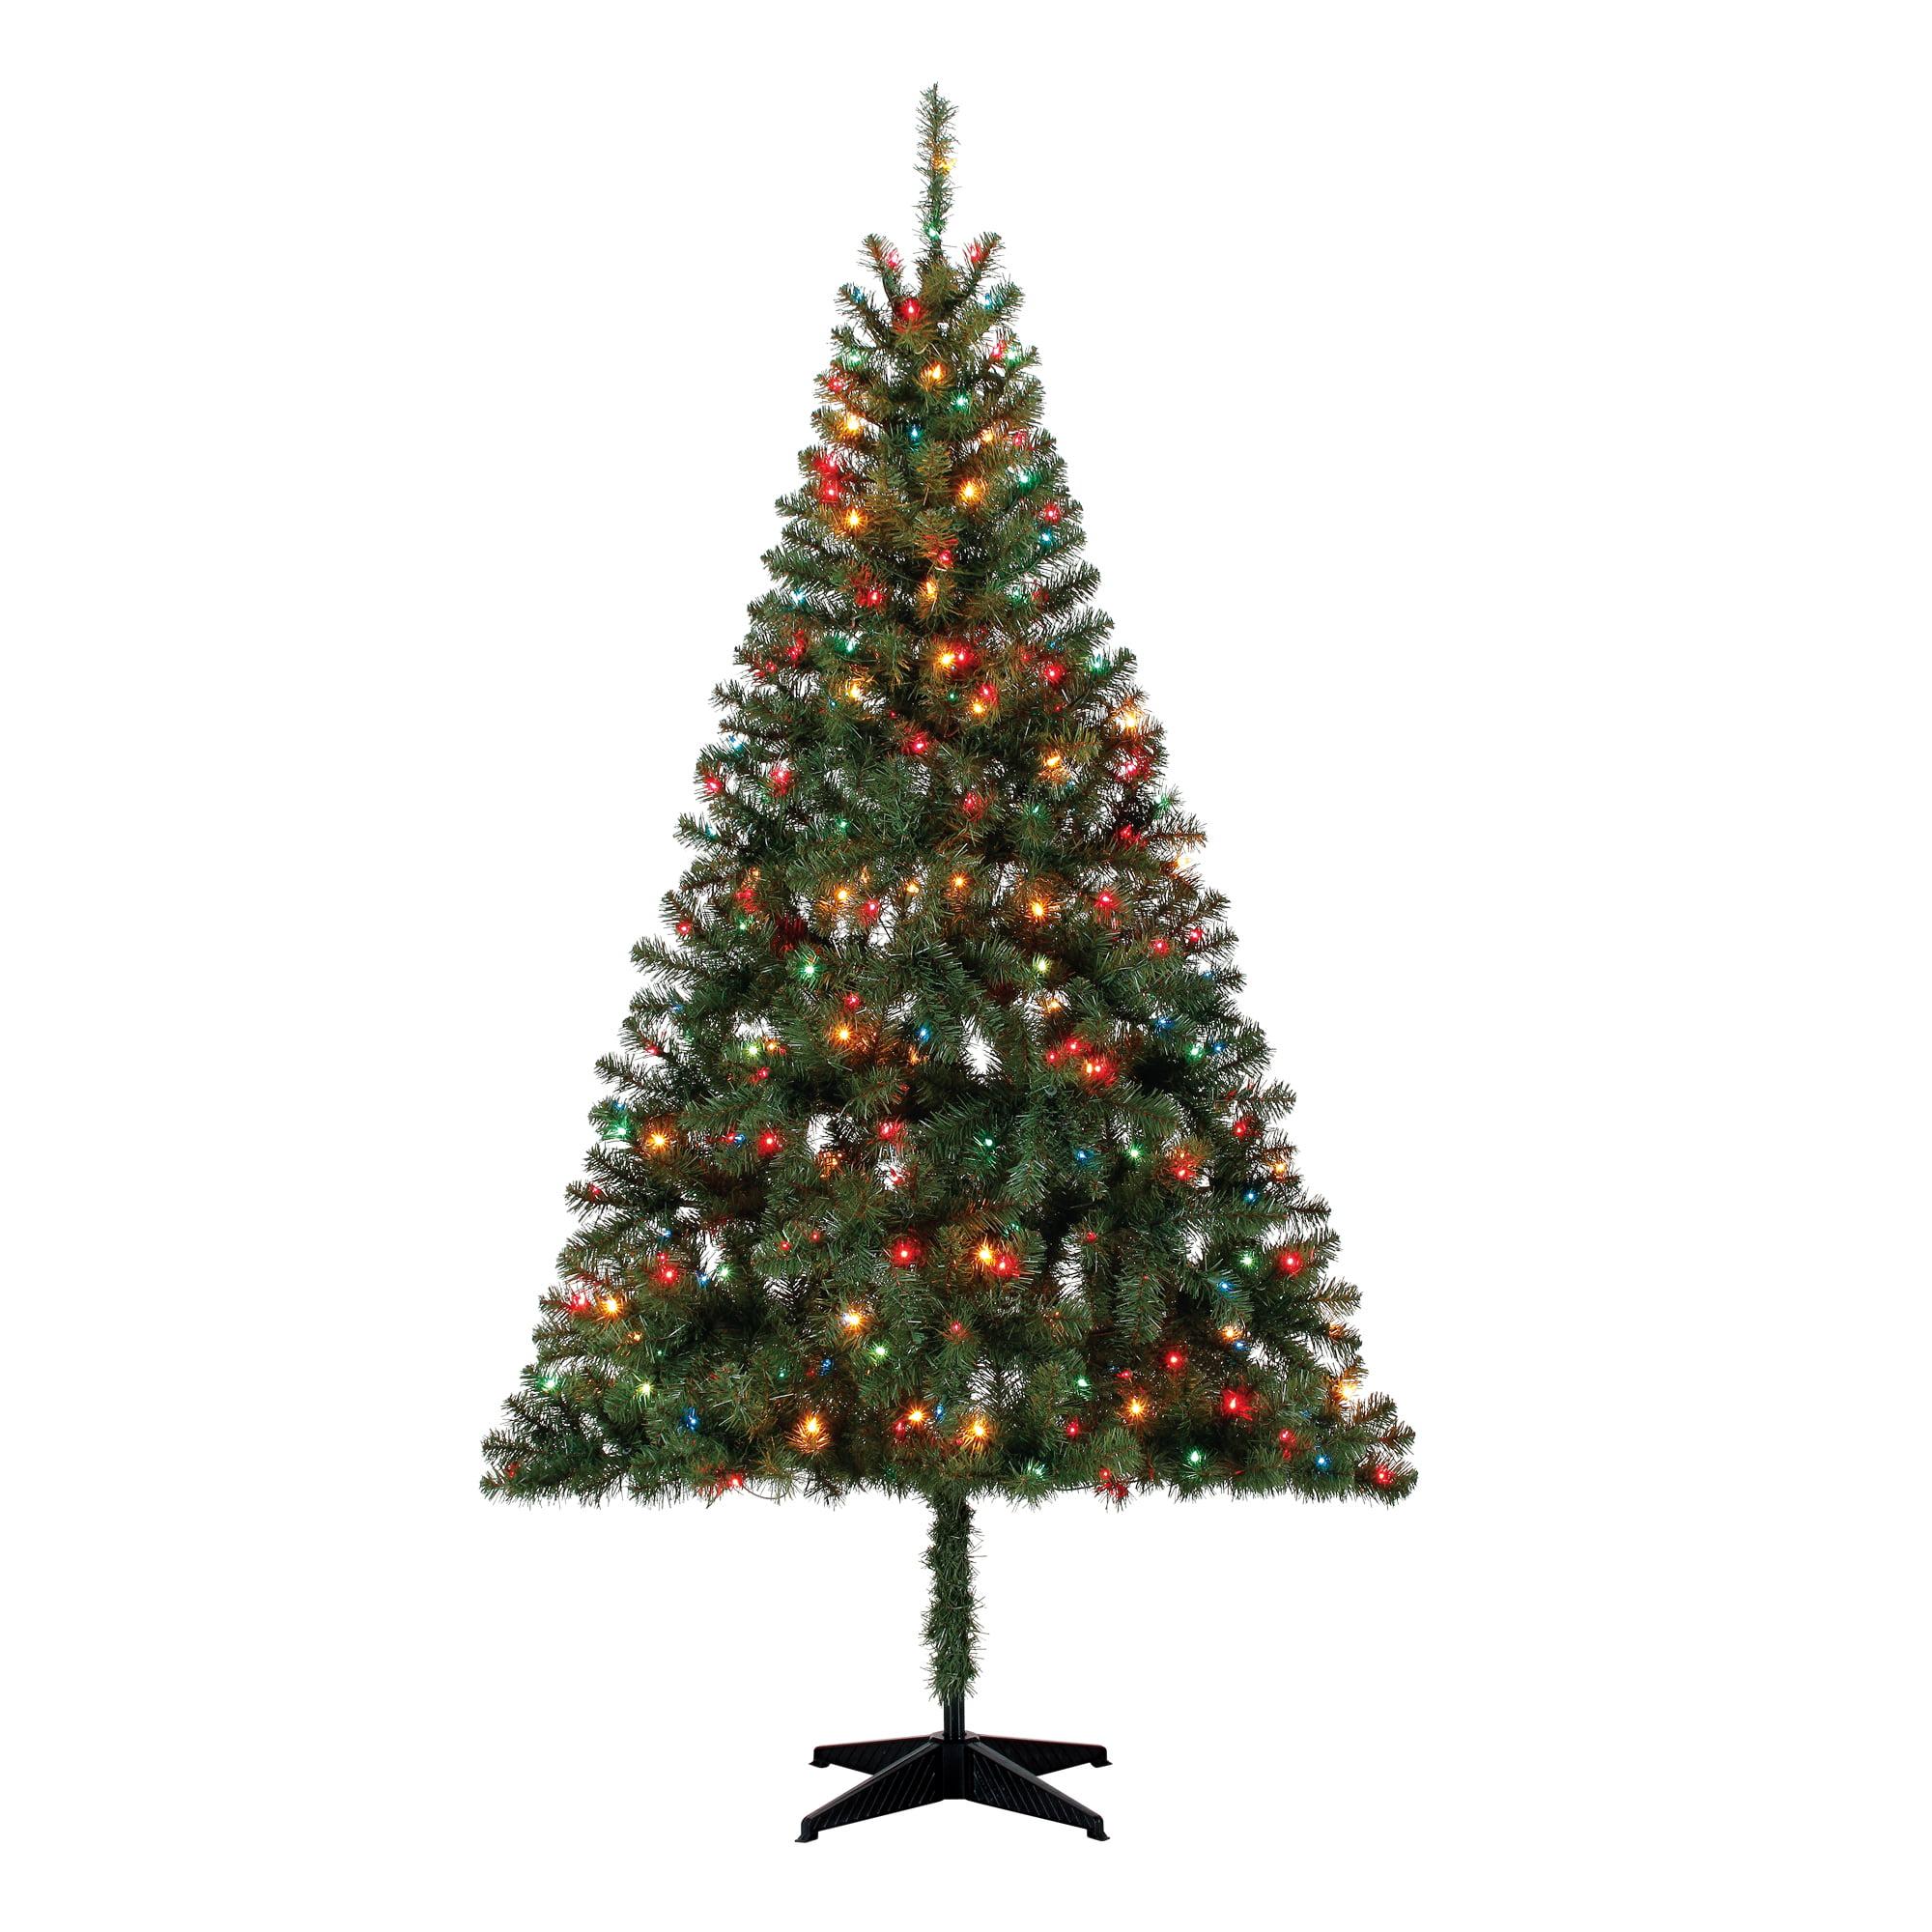 Madison Pine Christmas Tree: Holiday Time Pre-Lit 6.5' Madison Pine Green Artificial